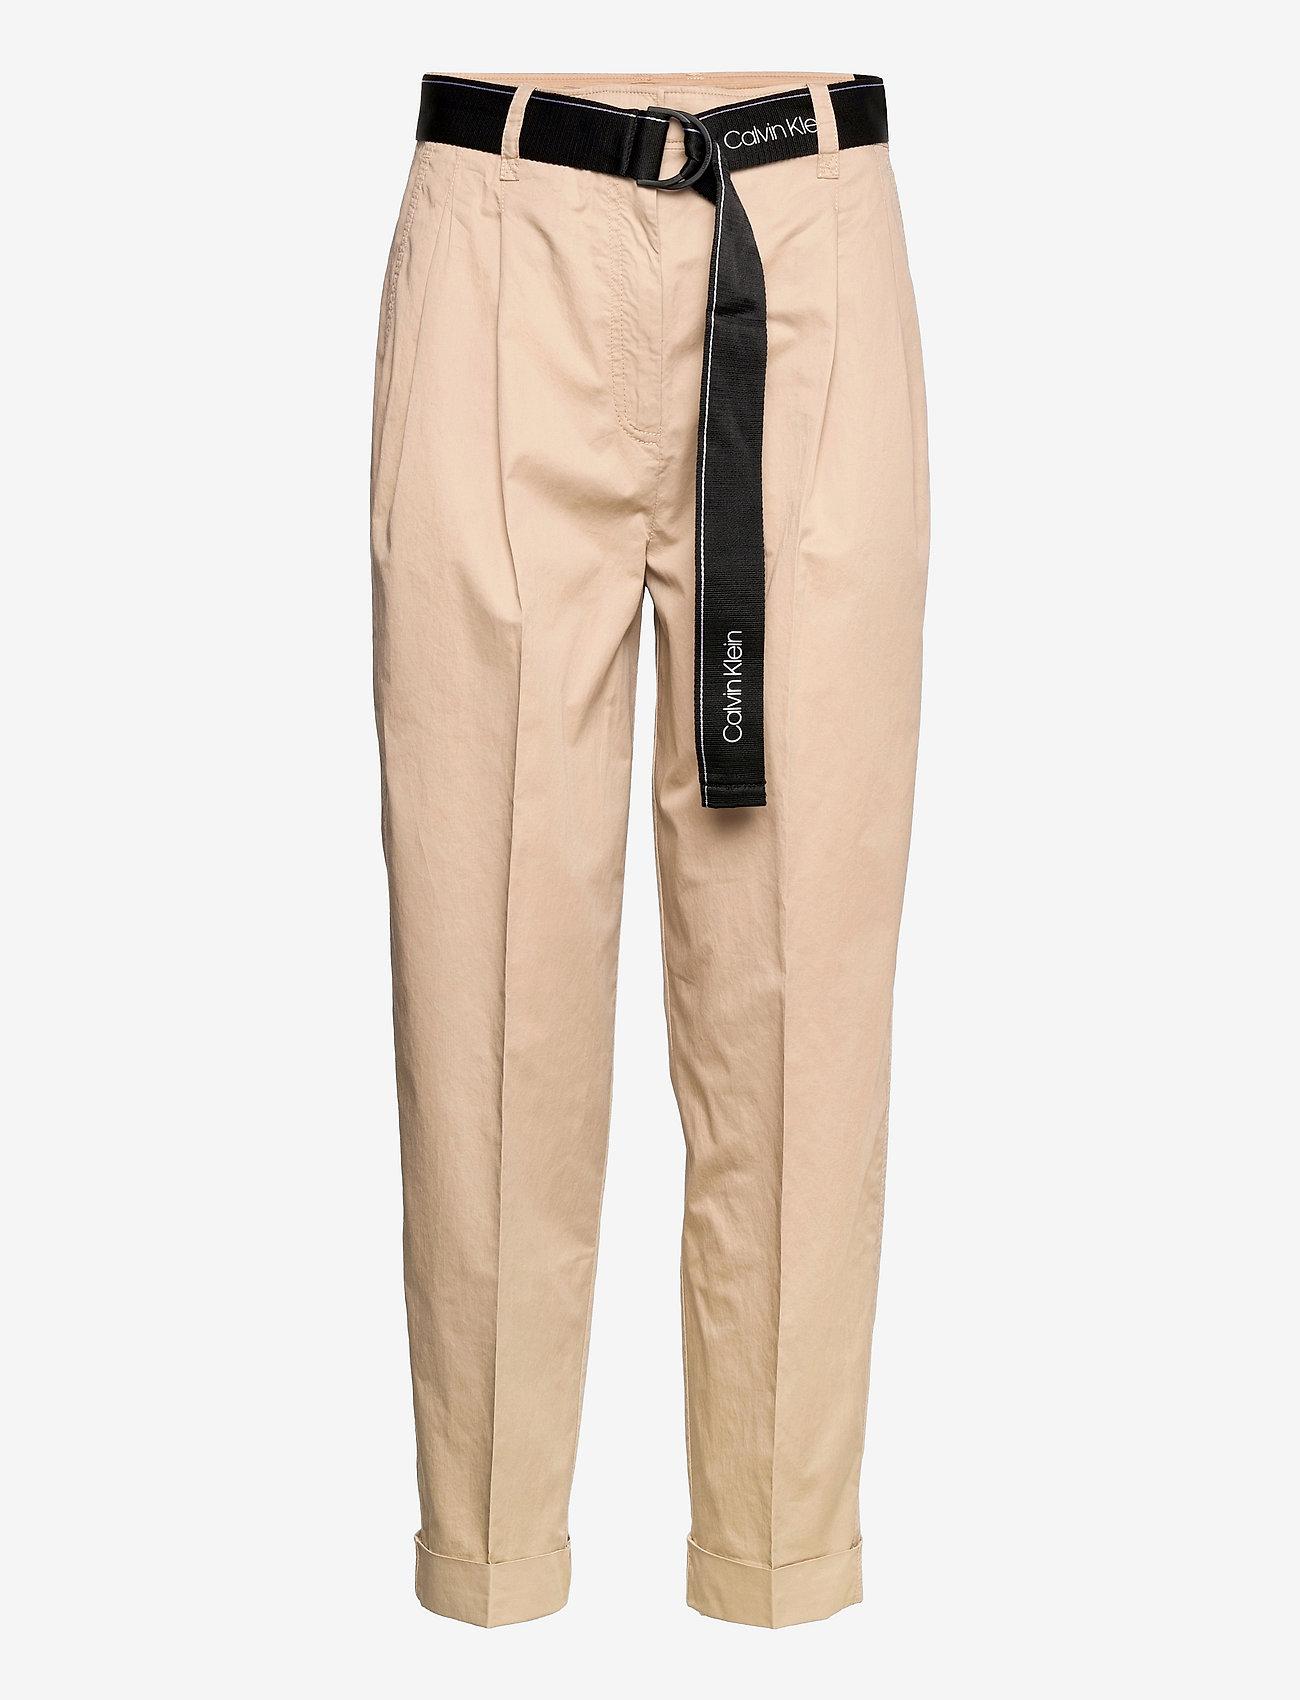 Calvin Klein - SILKY TOUCH PANT - pantalons droits - humus - 0